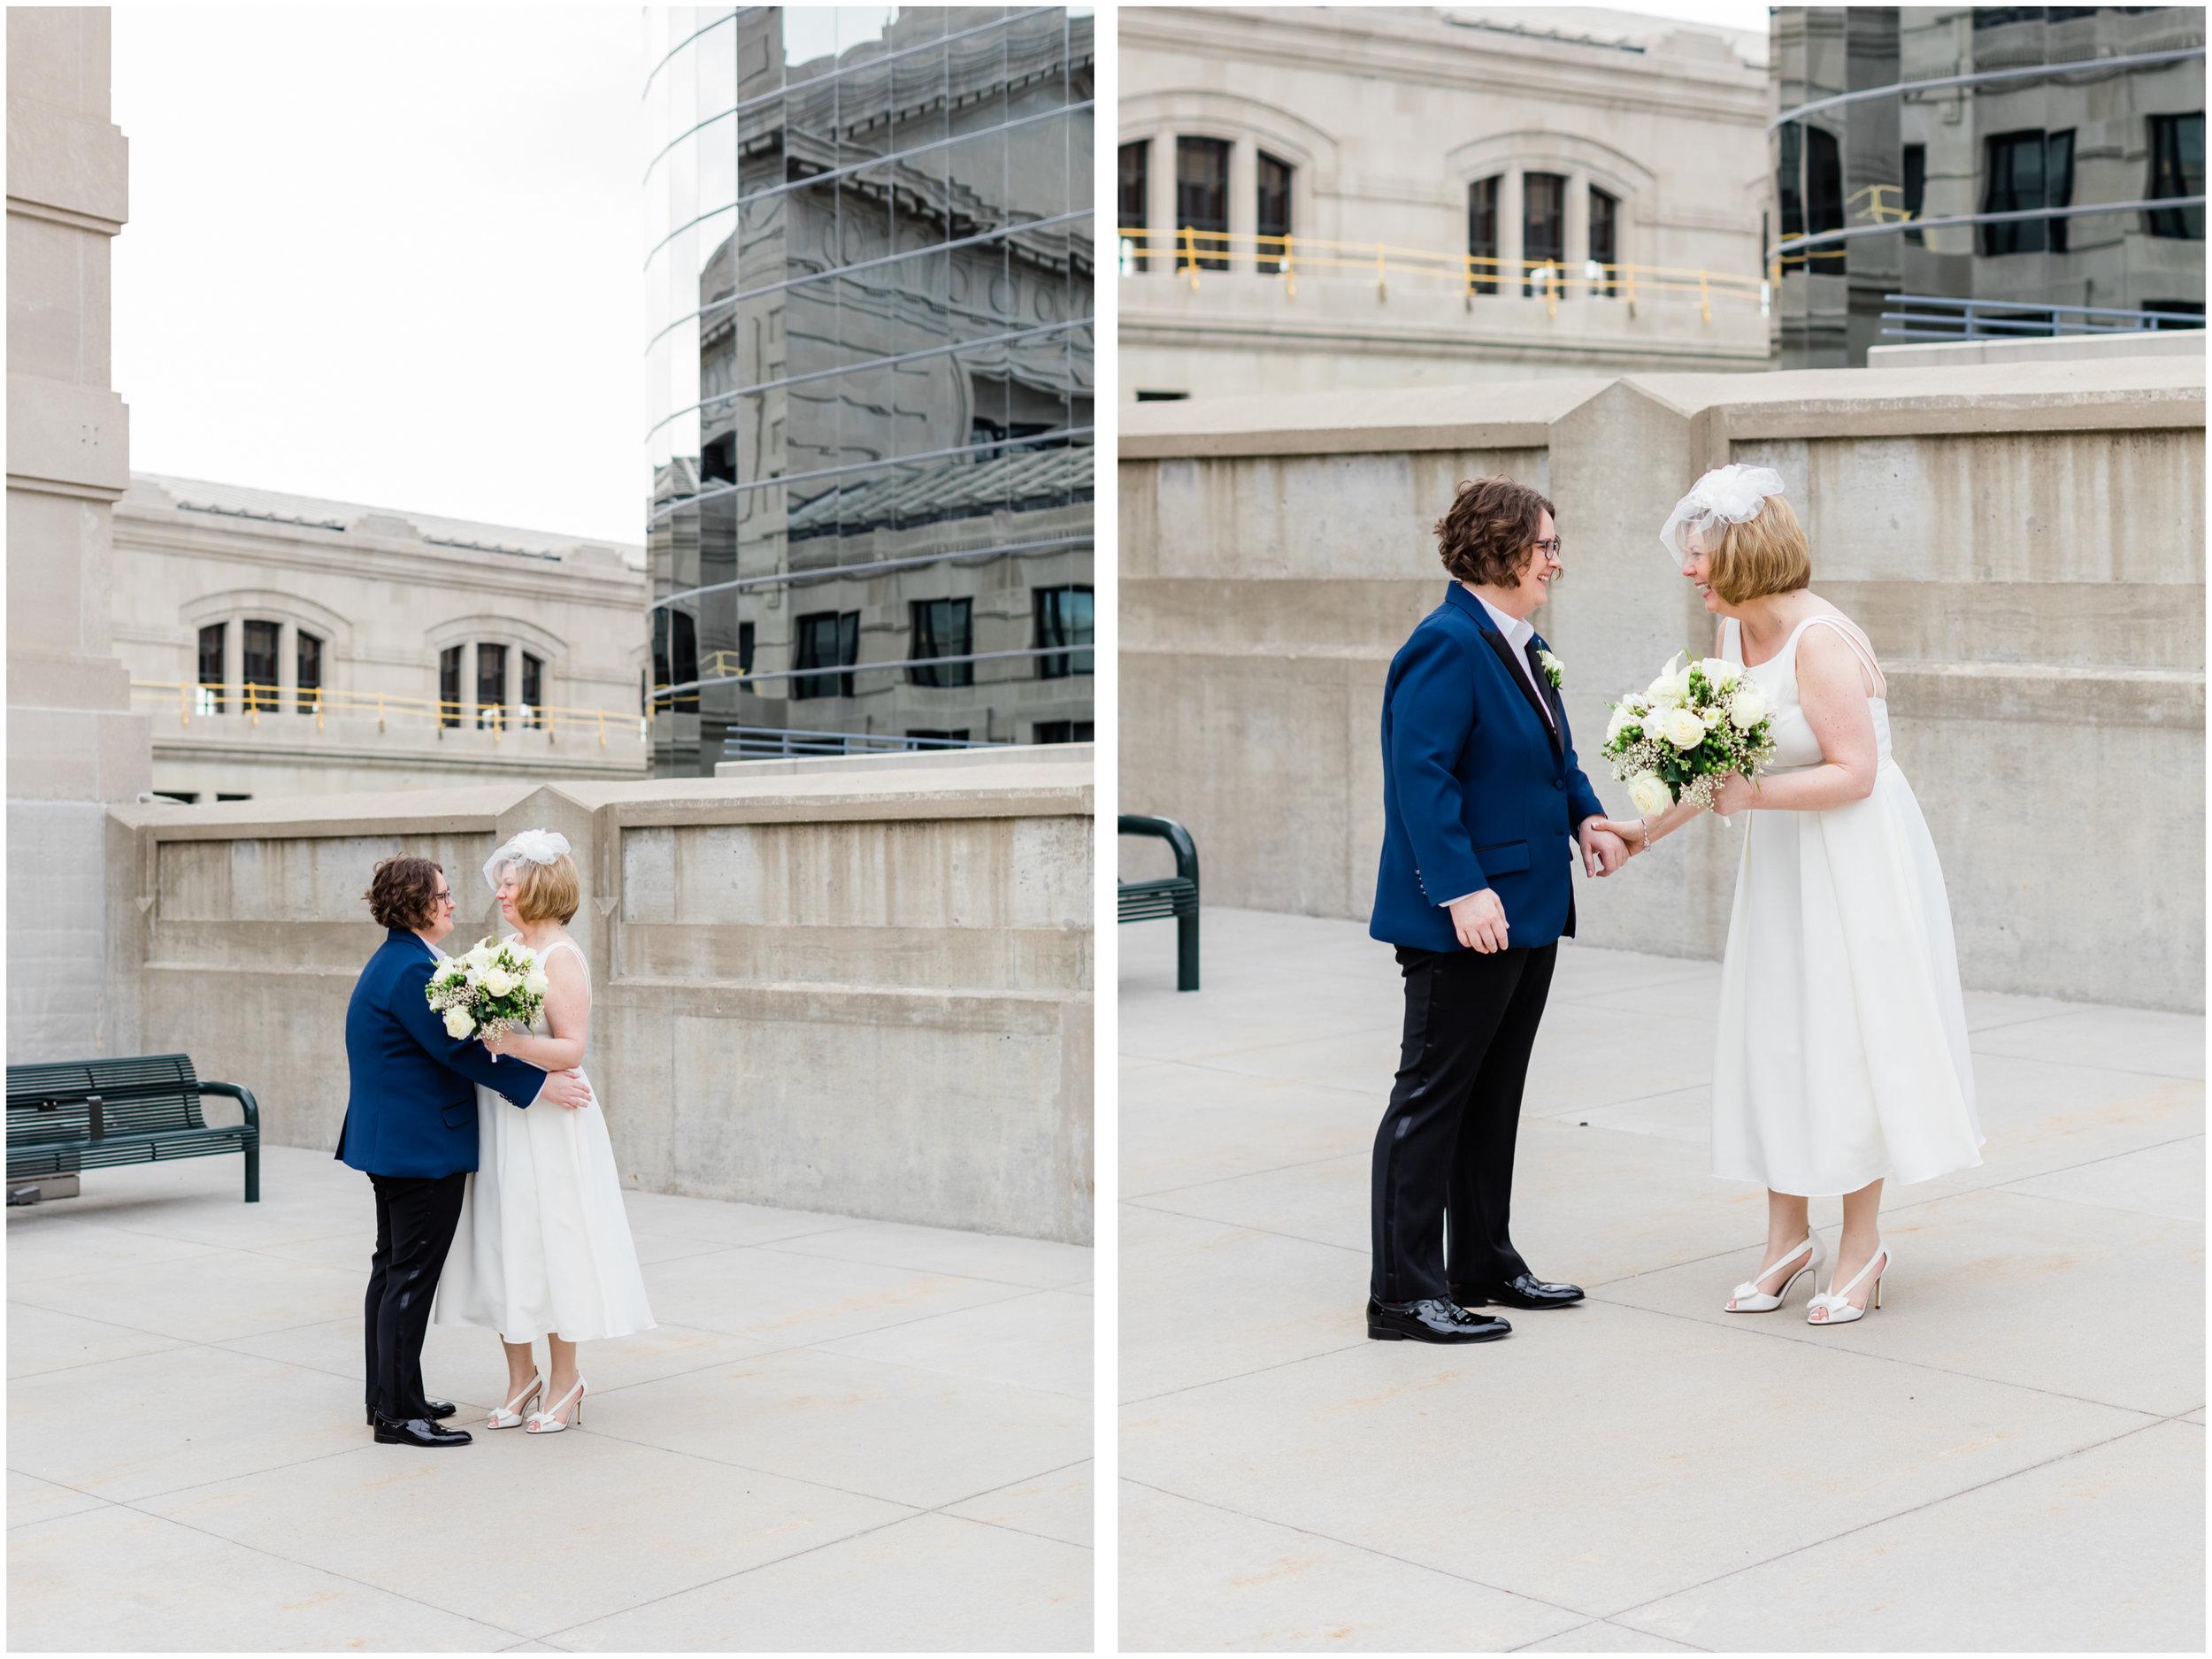 KC Union Station Wedding 2.jpg